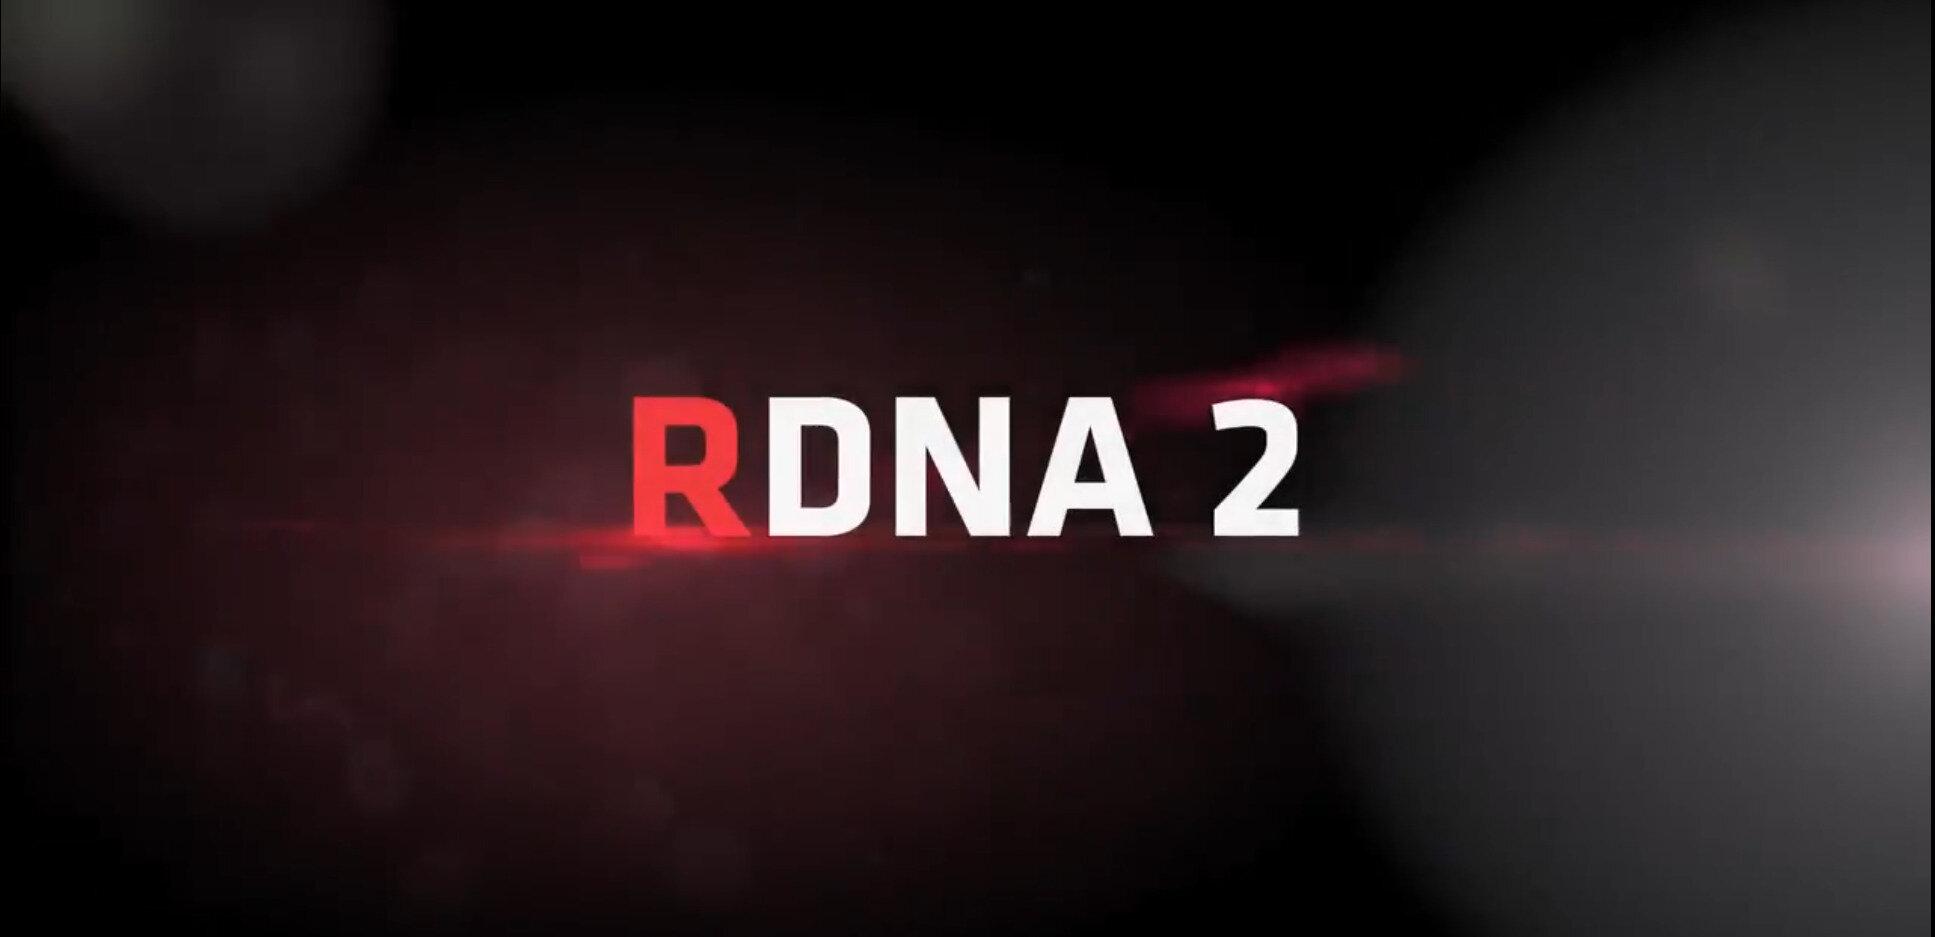 Radeon RX 6000 (RDNA 2, Navi 2X) : jusqu'à trois ventilateurs et 8+8 broches